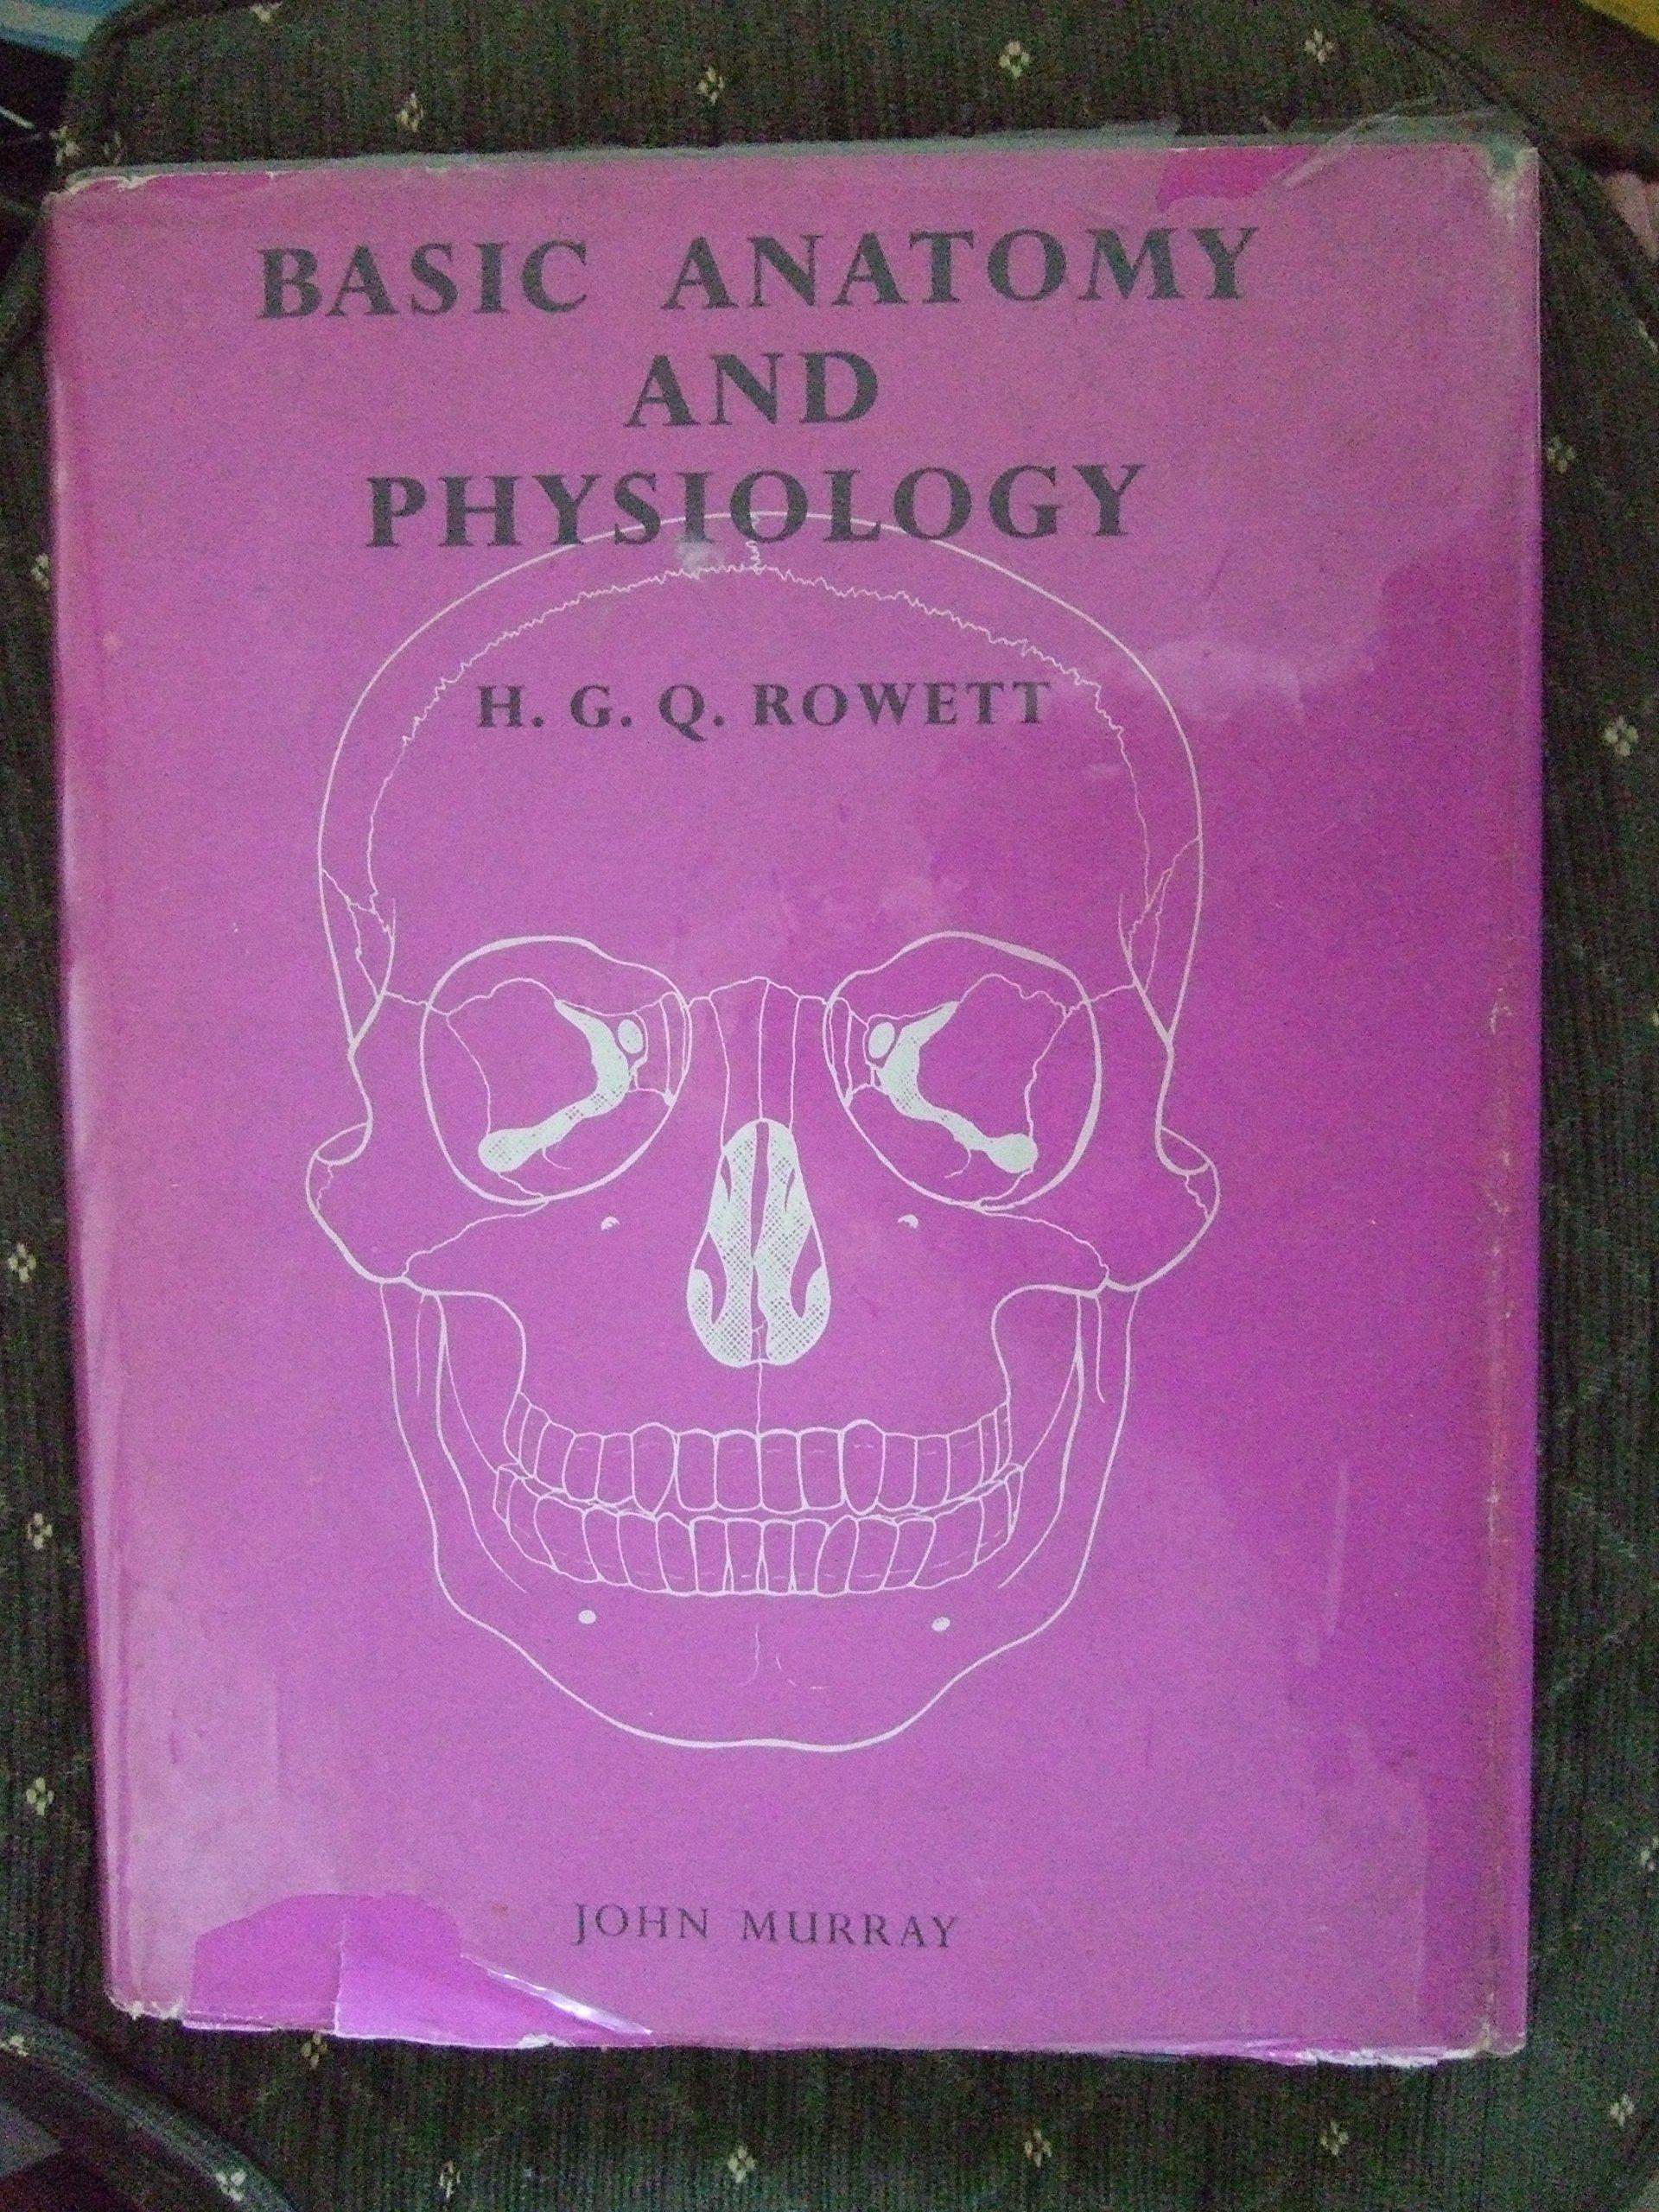 Basic Anatomy and Physiology: H G Q Rowett: Amazon.com: Books